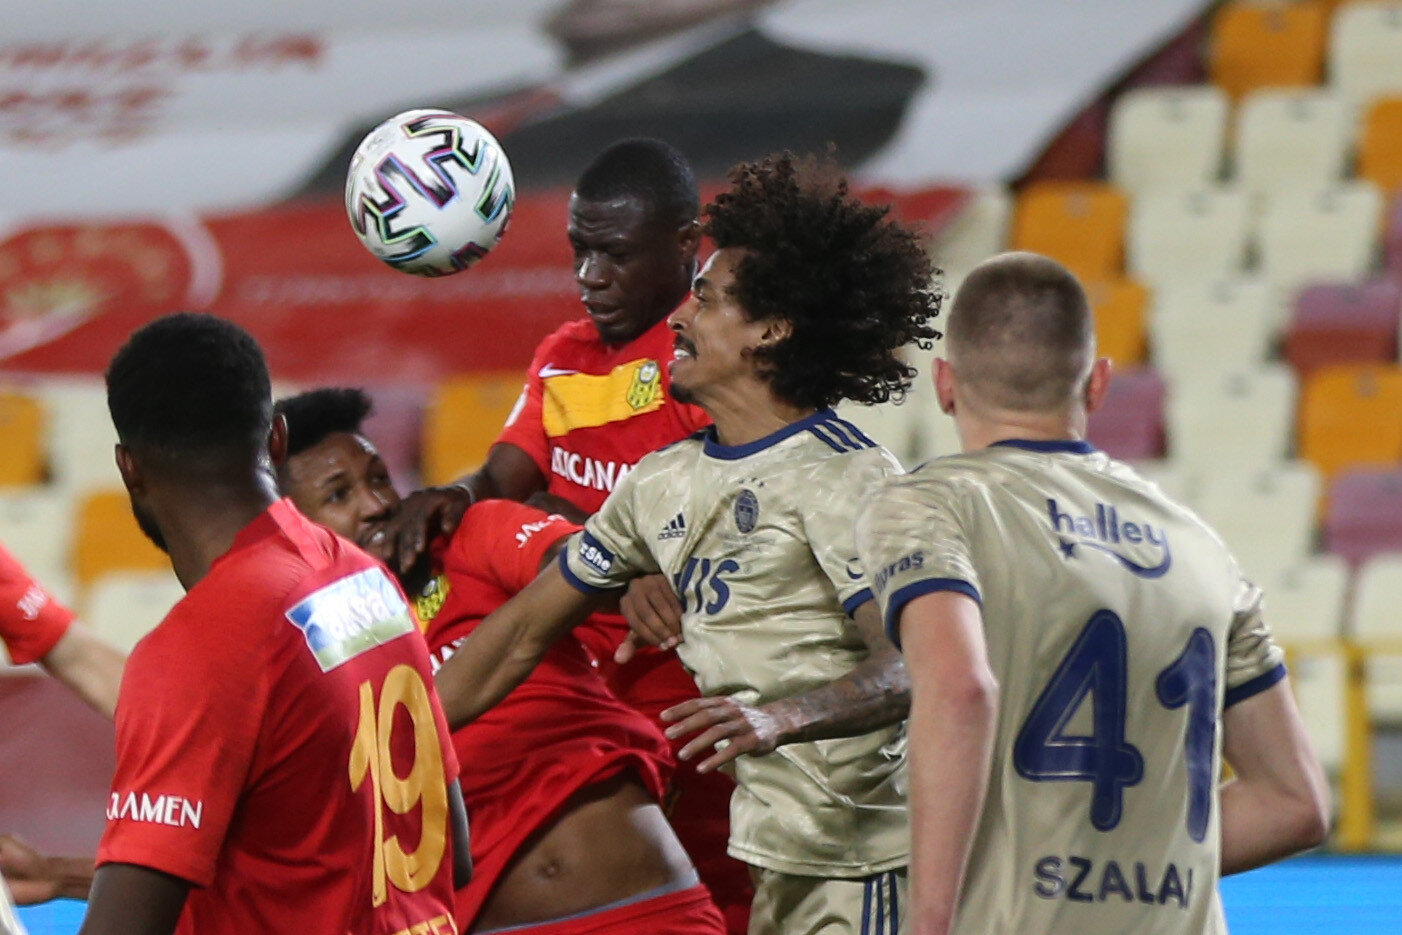 Maça ilk 11'de başlayan Gustavo, 77. dakikada yerini Sosa'ya bıraktı.